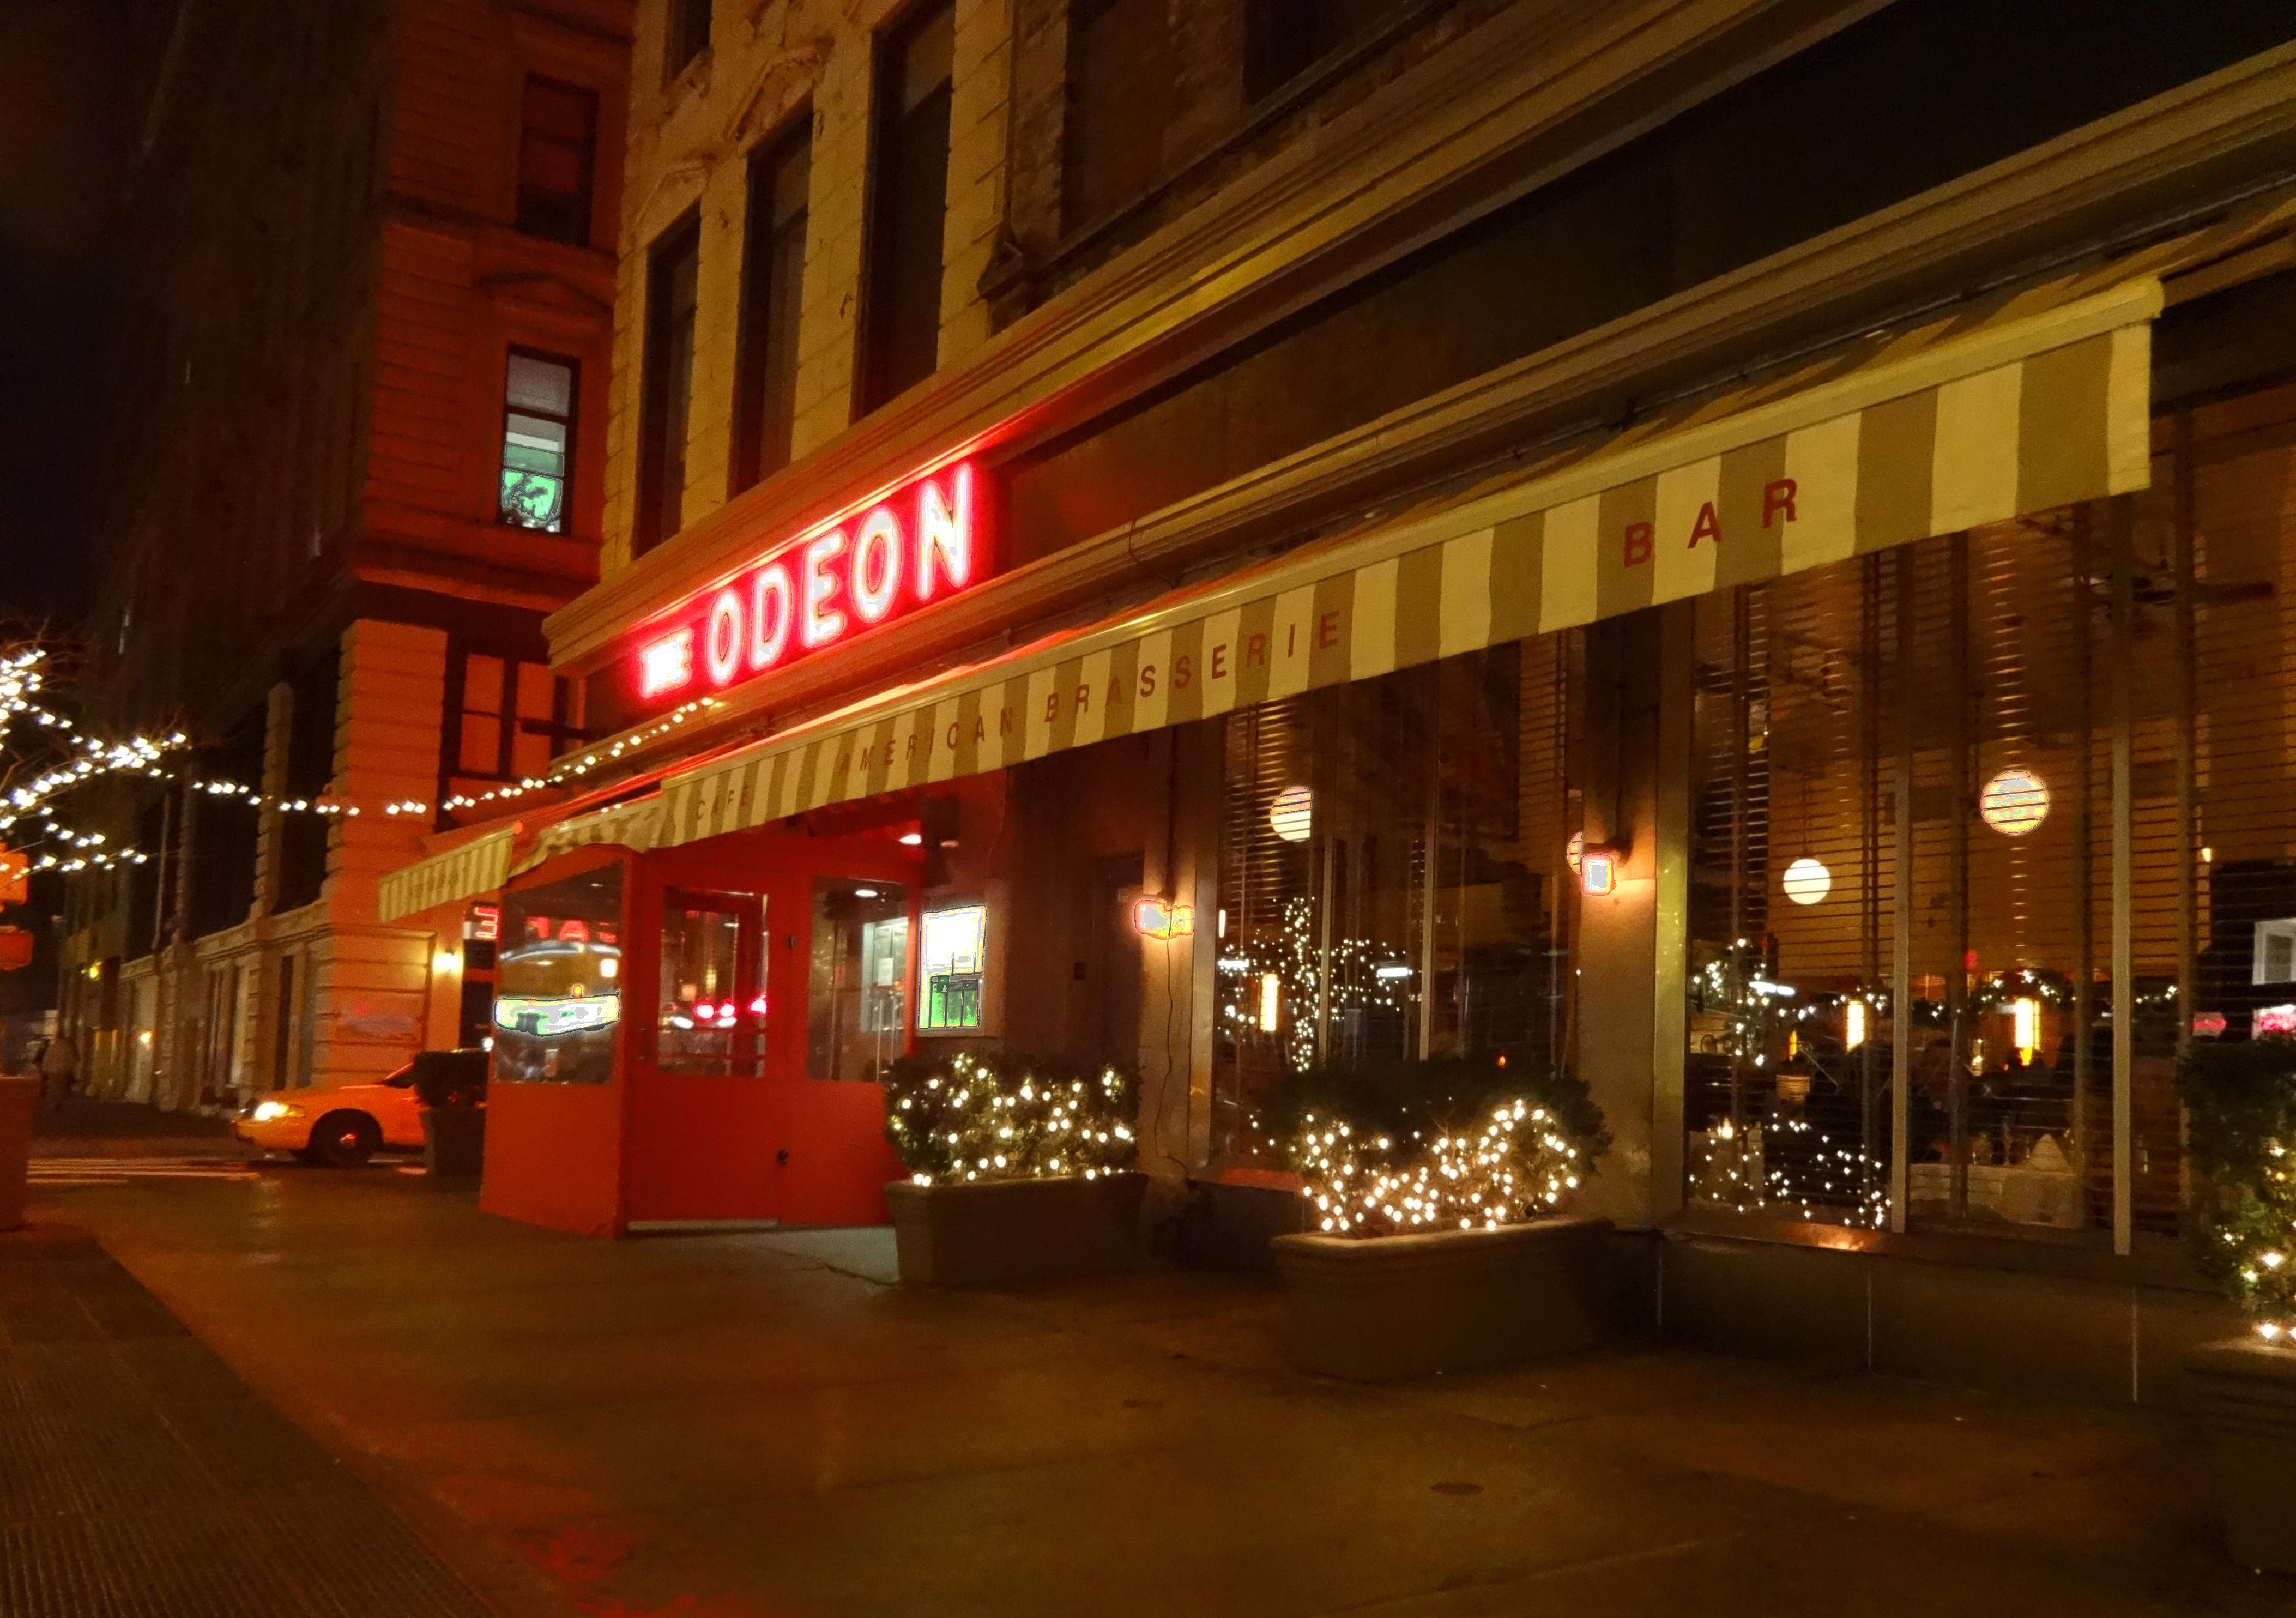 Odeon night 12-26-2013